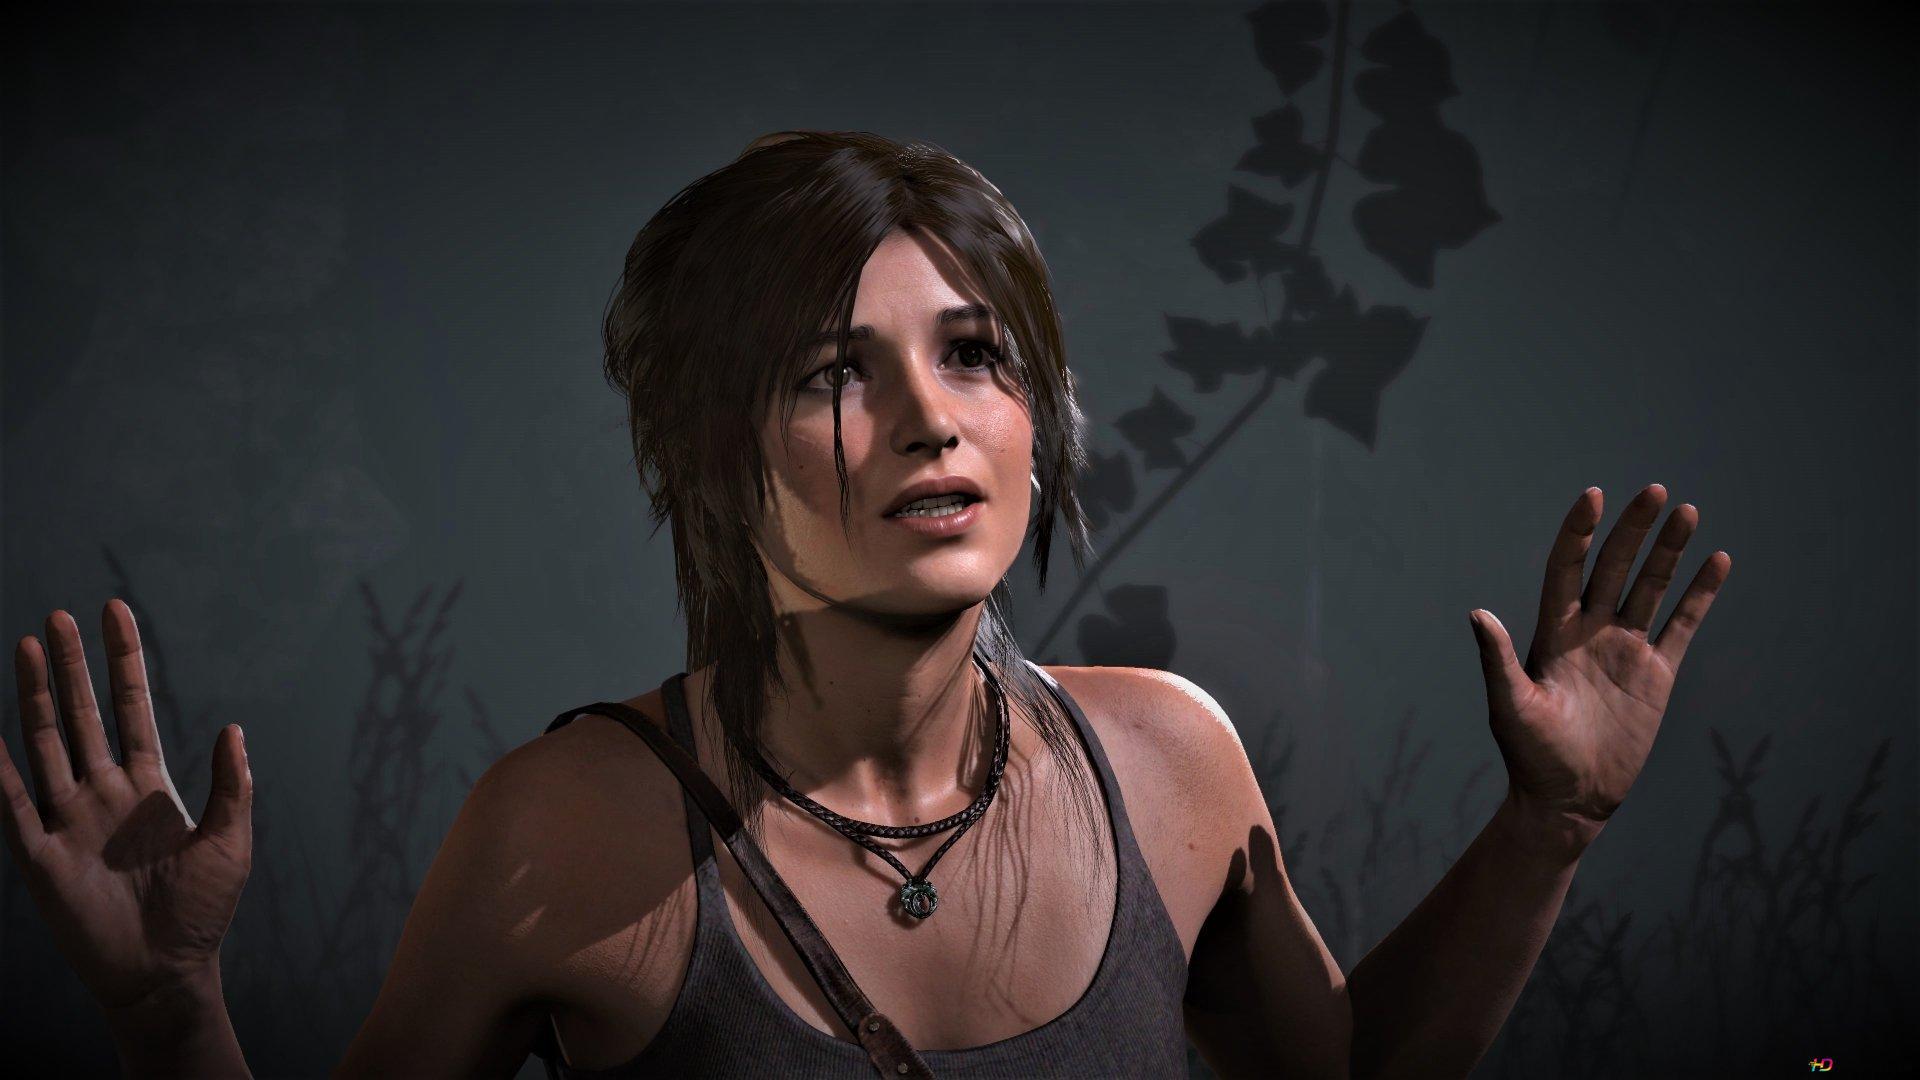 Lara Croft Rise Of The Tomb Raider Hd Wallpaper Download